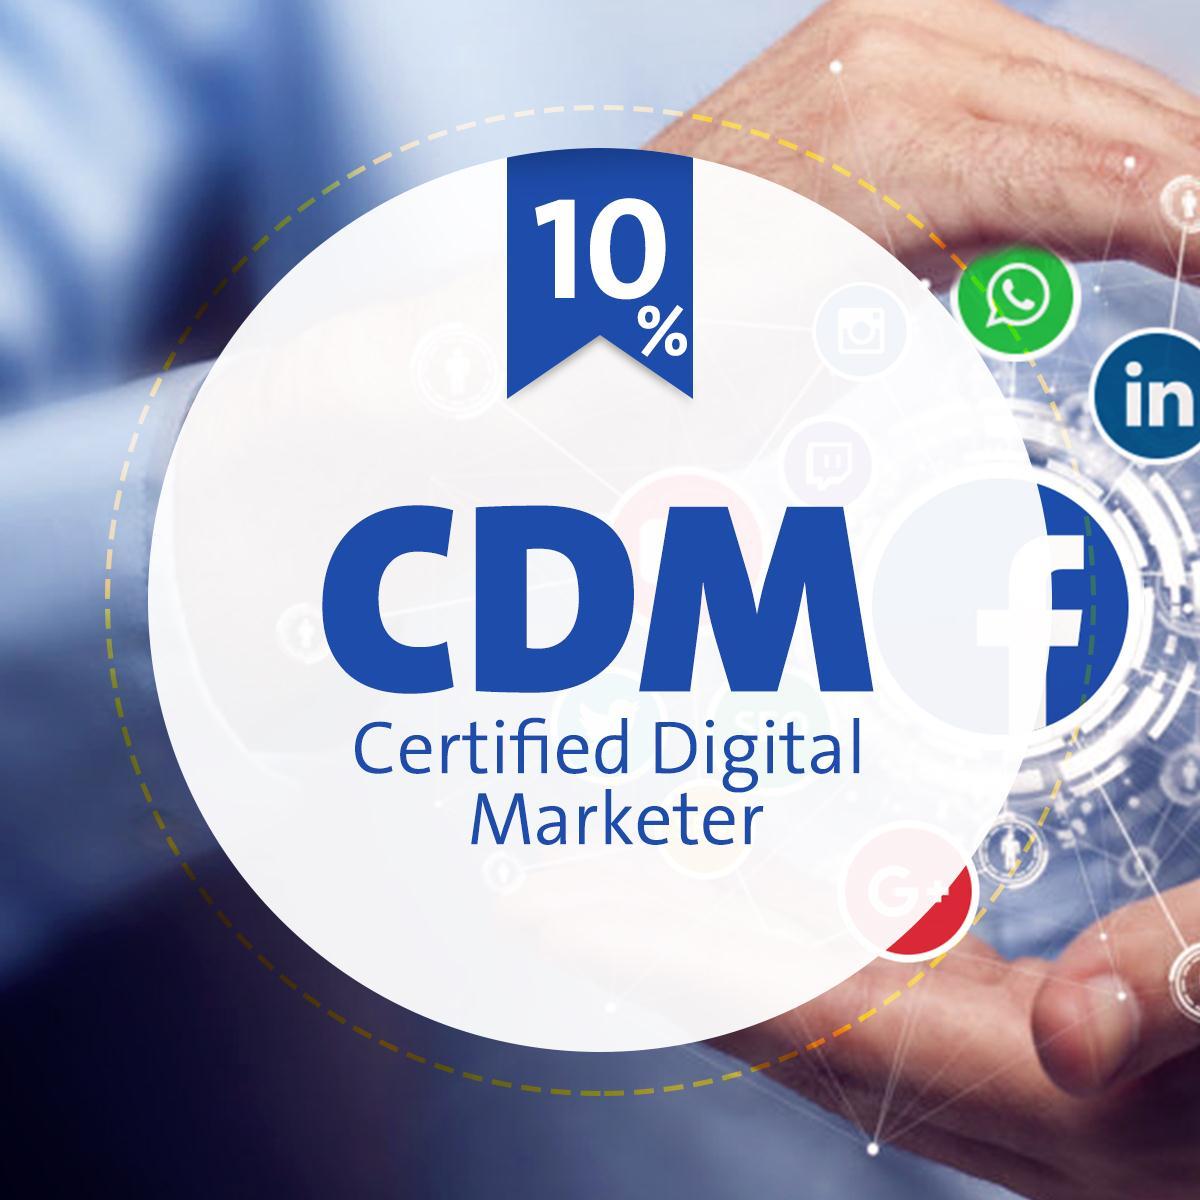 Cdm Certified Digital Marketer Training Course Pioneers Academy